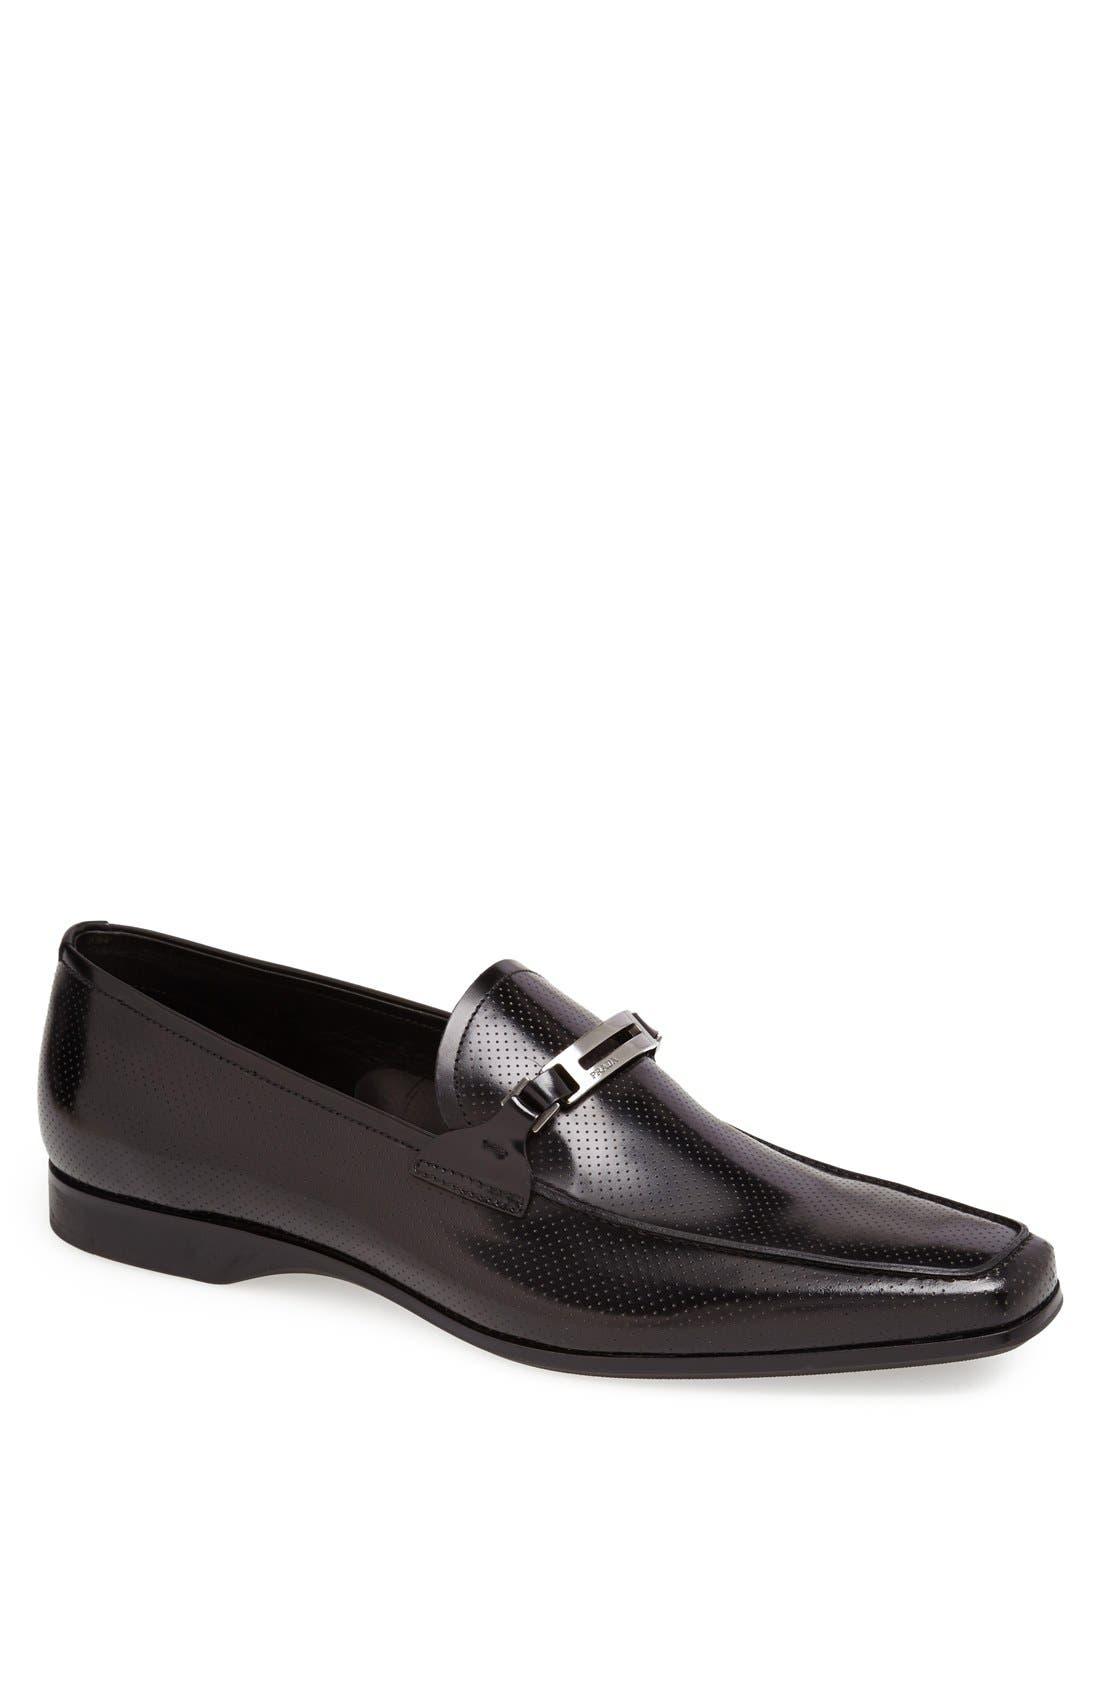 Alternate Image 1 Selected - Prada Leather Bit Loafer